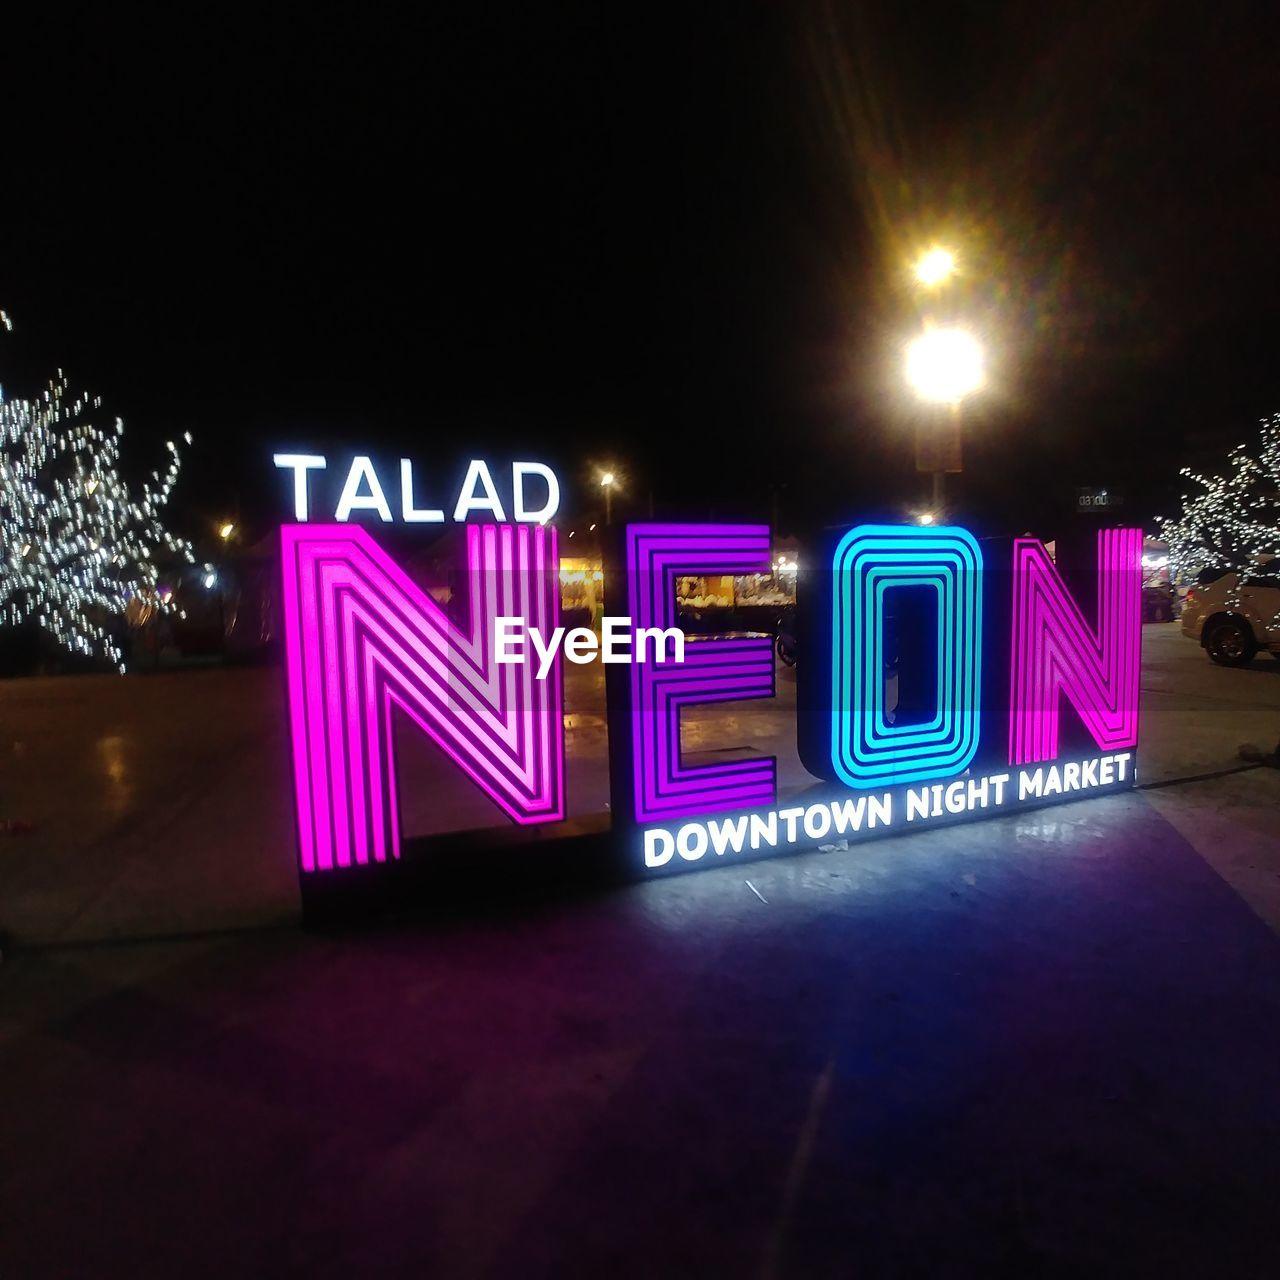 illuminated, night, neon, text, lighting equipment, communication, electricity, no people, outdoors, city